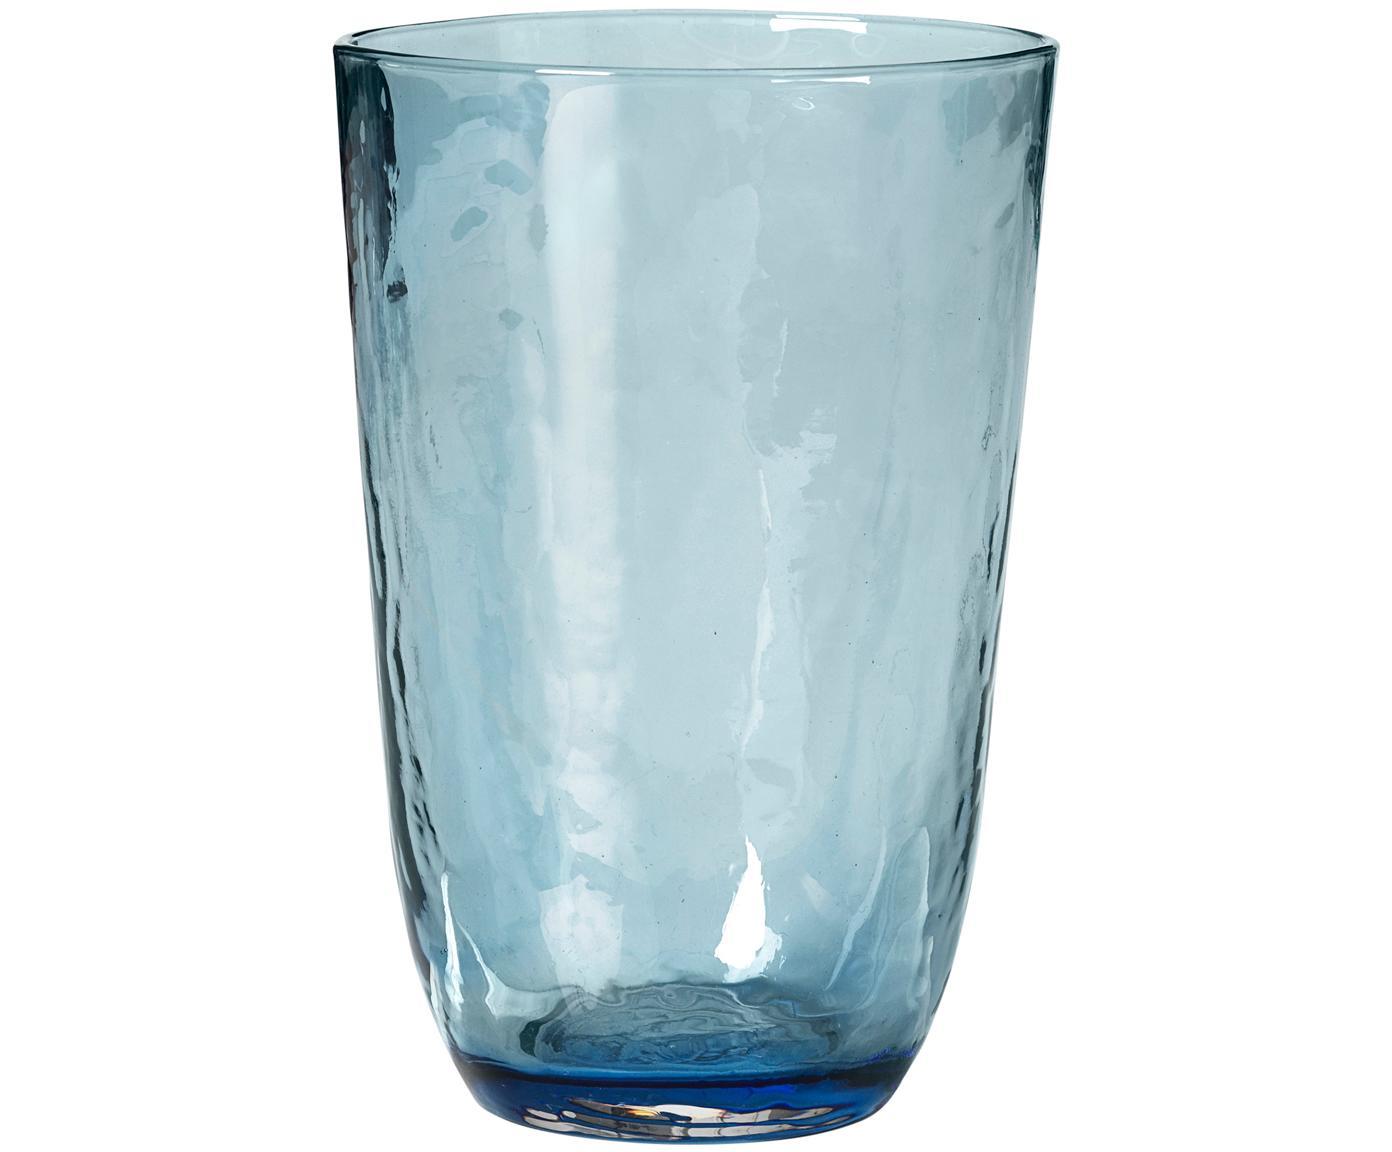 Vasos de vidrio soplado Hammered, 4uds., Vidrio soplado artesanalmente, Azul, transparente, Ø 9 x Al 14 cm